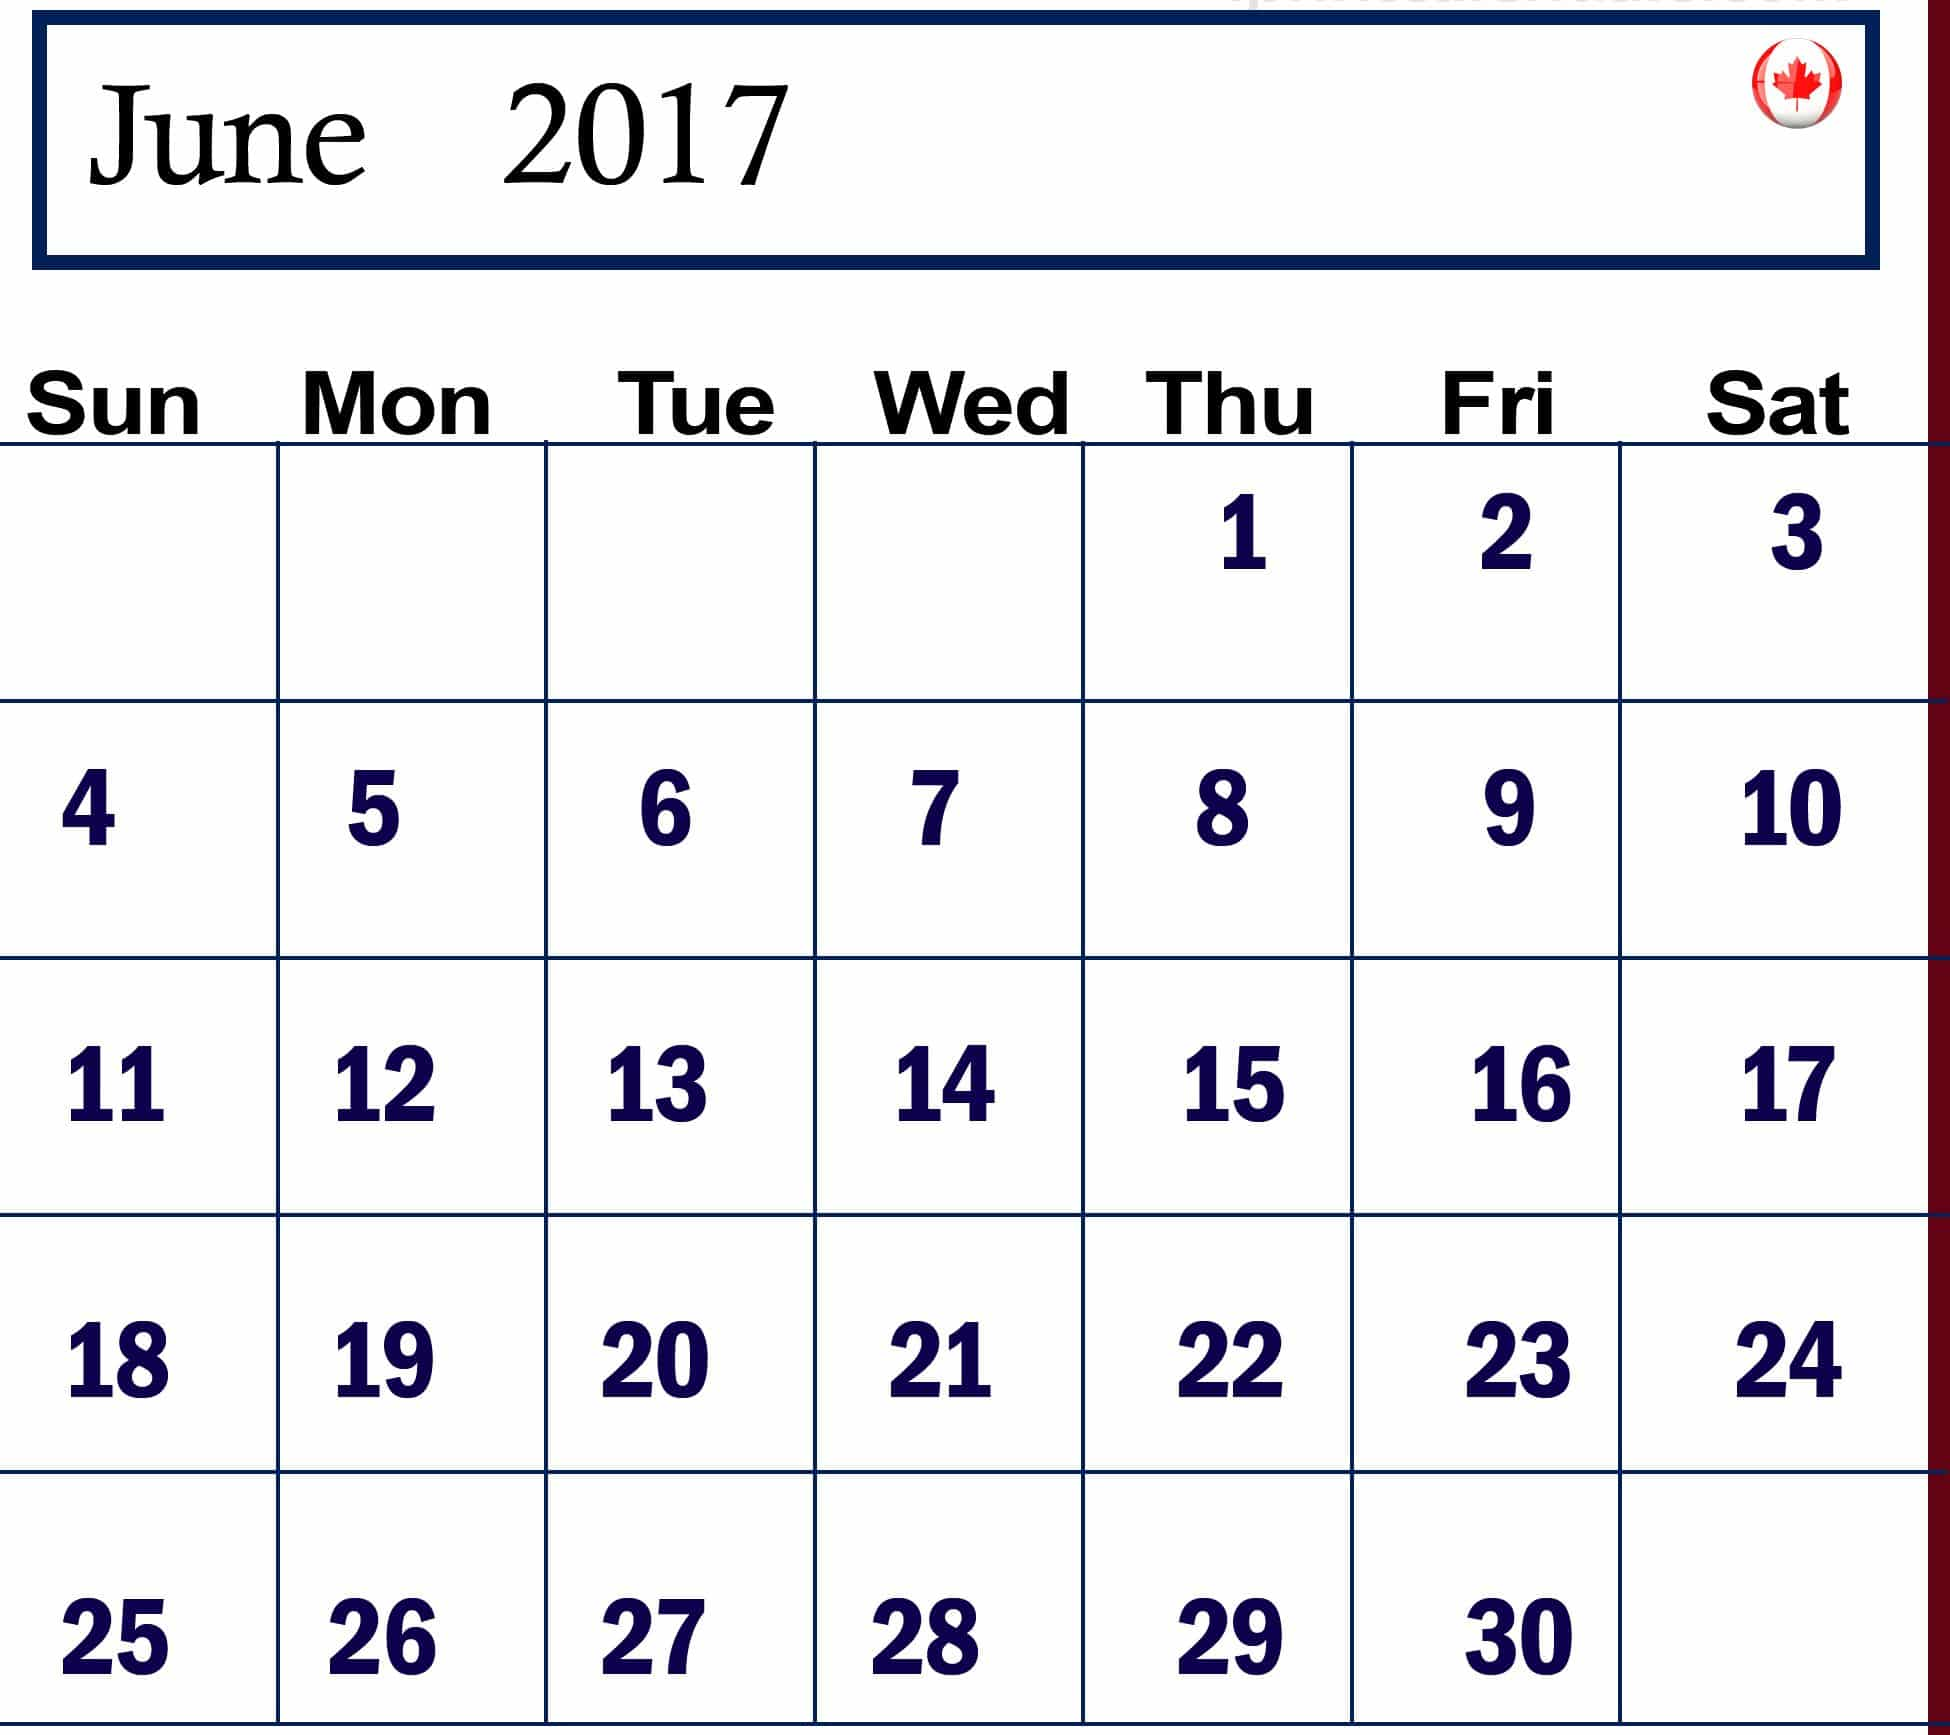 Download June 2017 calendar Canada